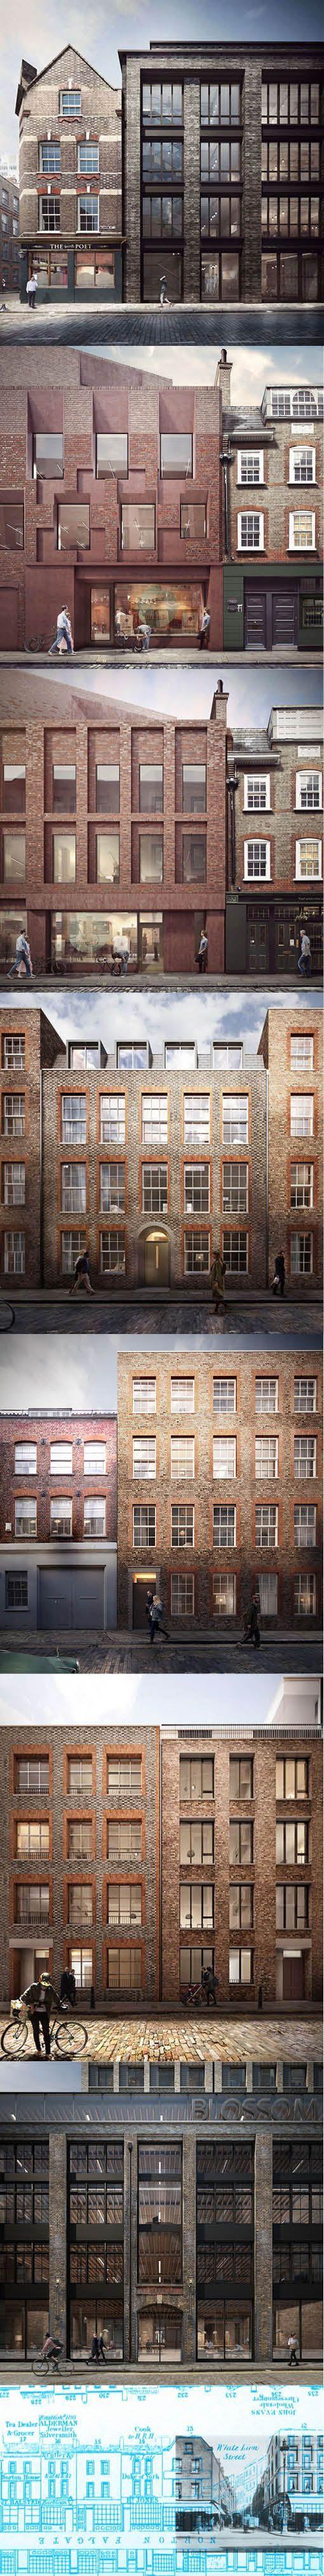 2015 duggan morris blossom street concept london uk brick ahmm - Brick Apartment 2015